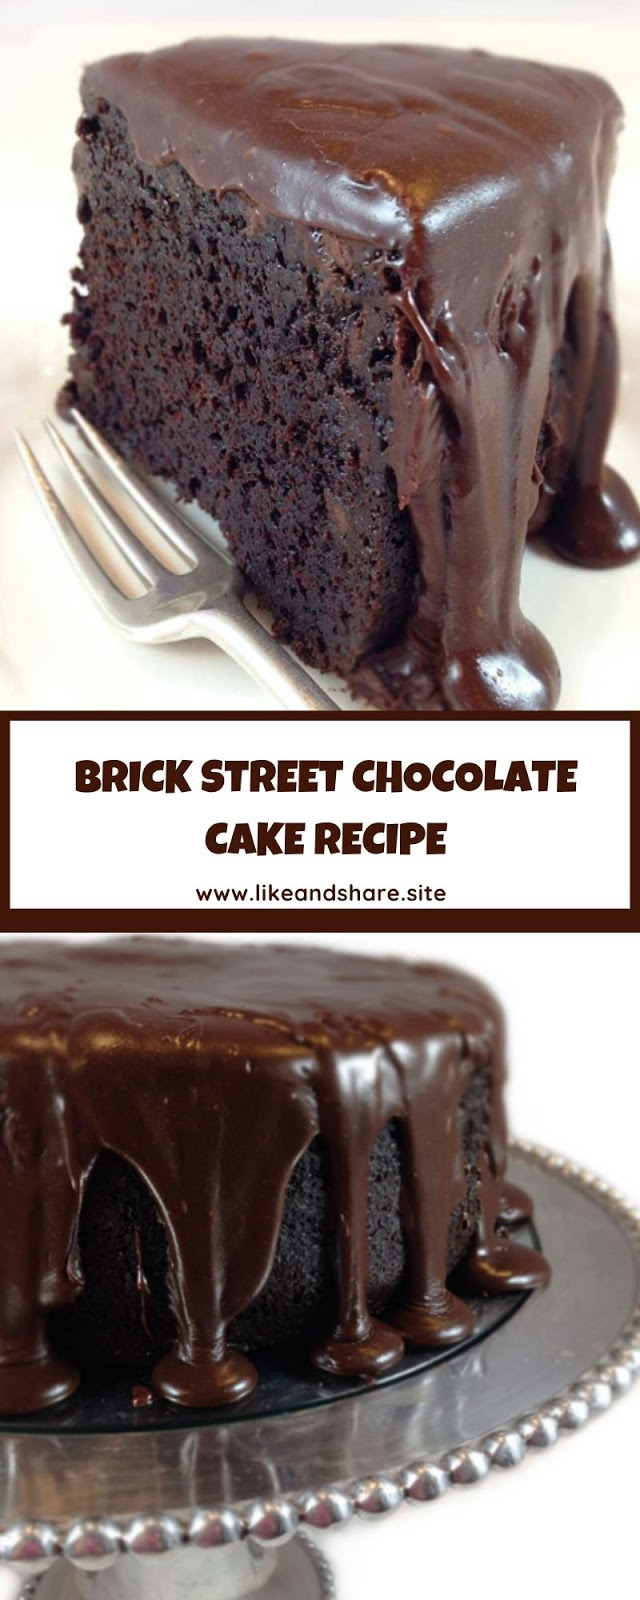 BRICK STREET CHOCOLATE CAKE RECIPE